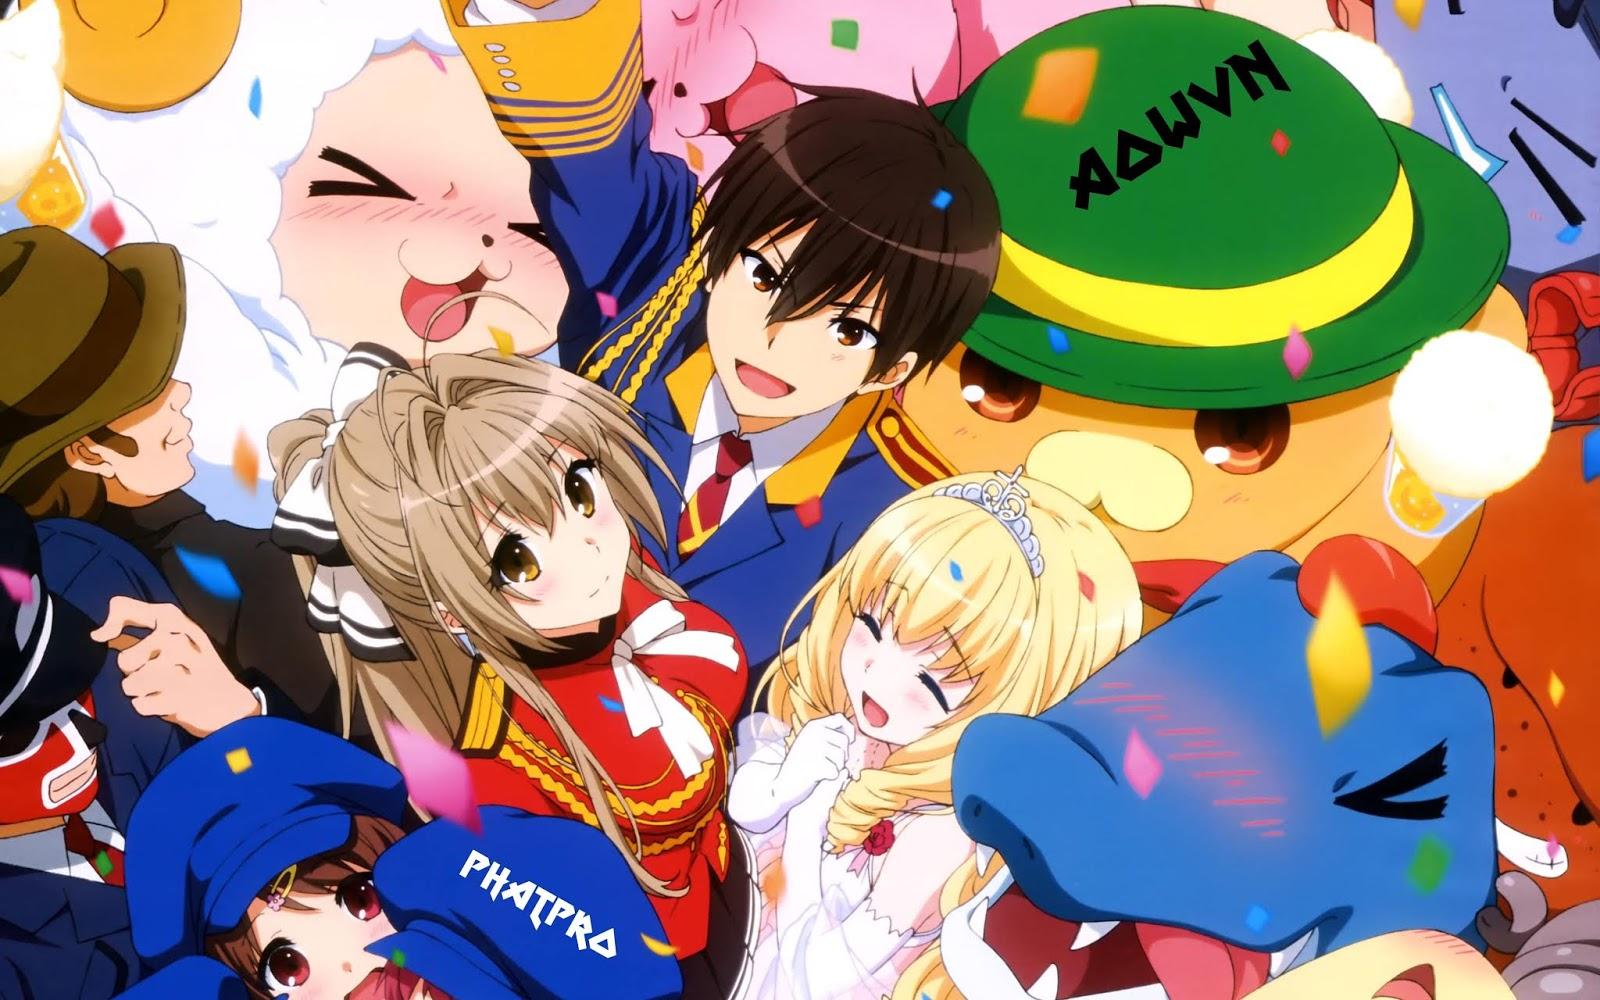 Amagi%2B %2BPhatpro%2B%25284%2529 min - [ Anime 3gp Mp4 ] Amagi Brilliant Park BD + Ova + SP | Vietsub - Cực Hài - Cực Moe